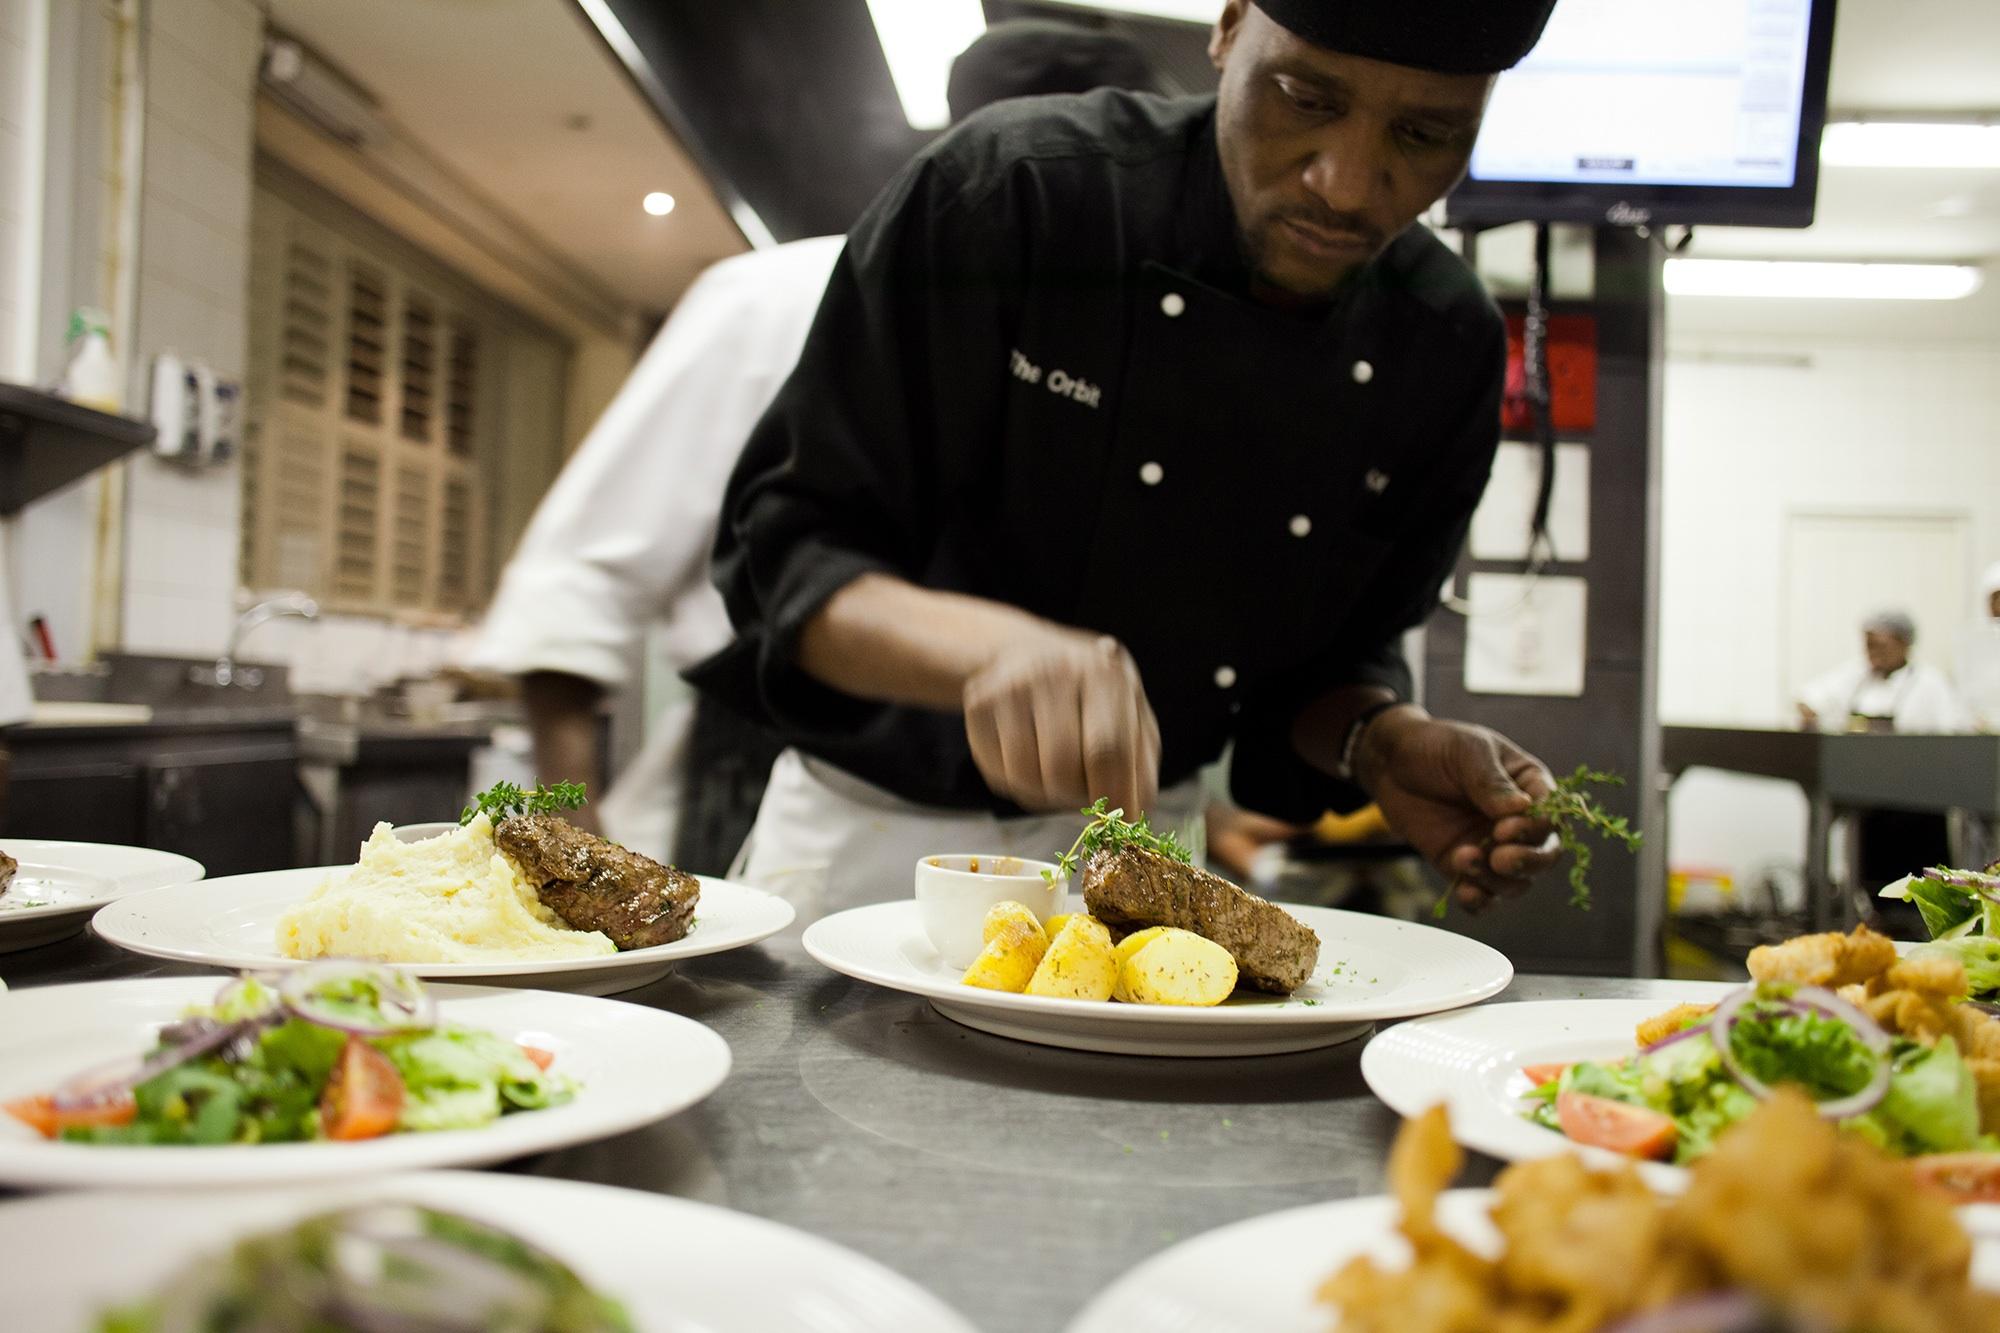 The orbit restaurant in johannesburg eatout for African cuisine braamfontein